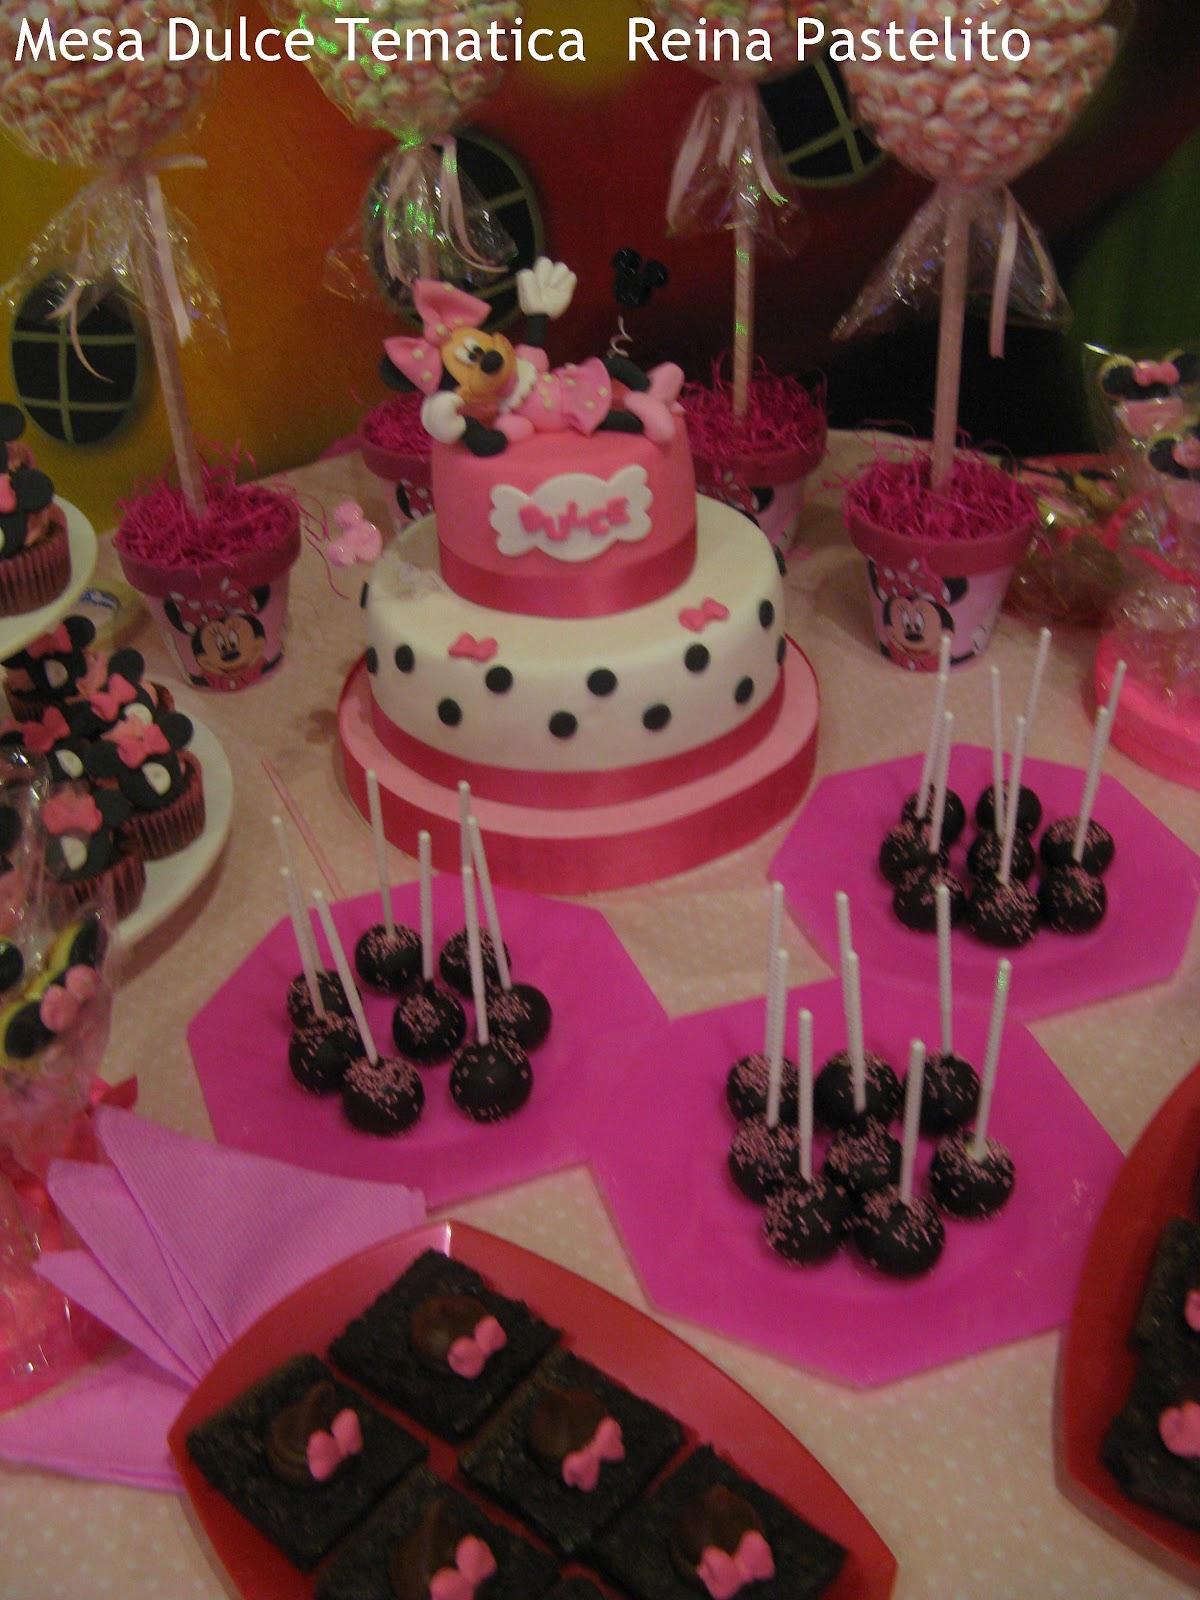 Mesa dulce tematica Minnie Mouse,